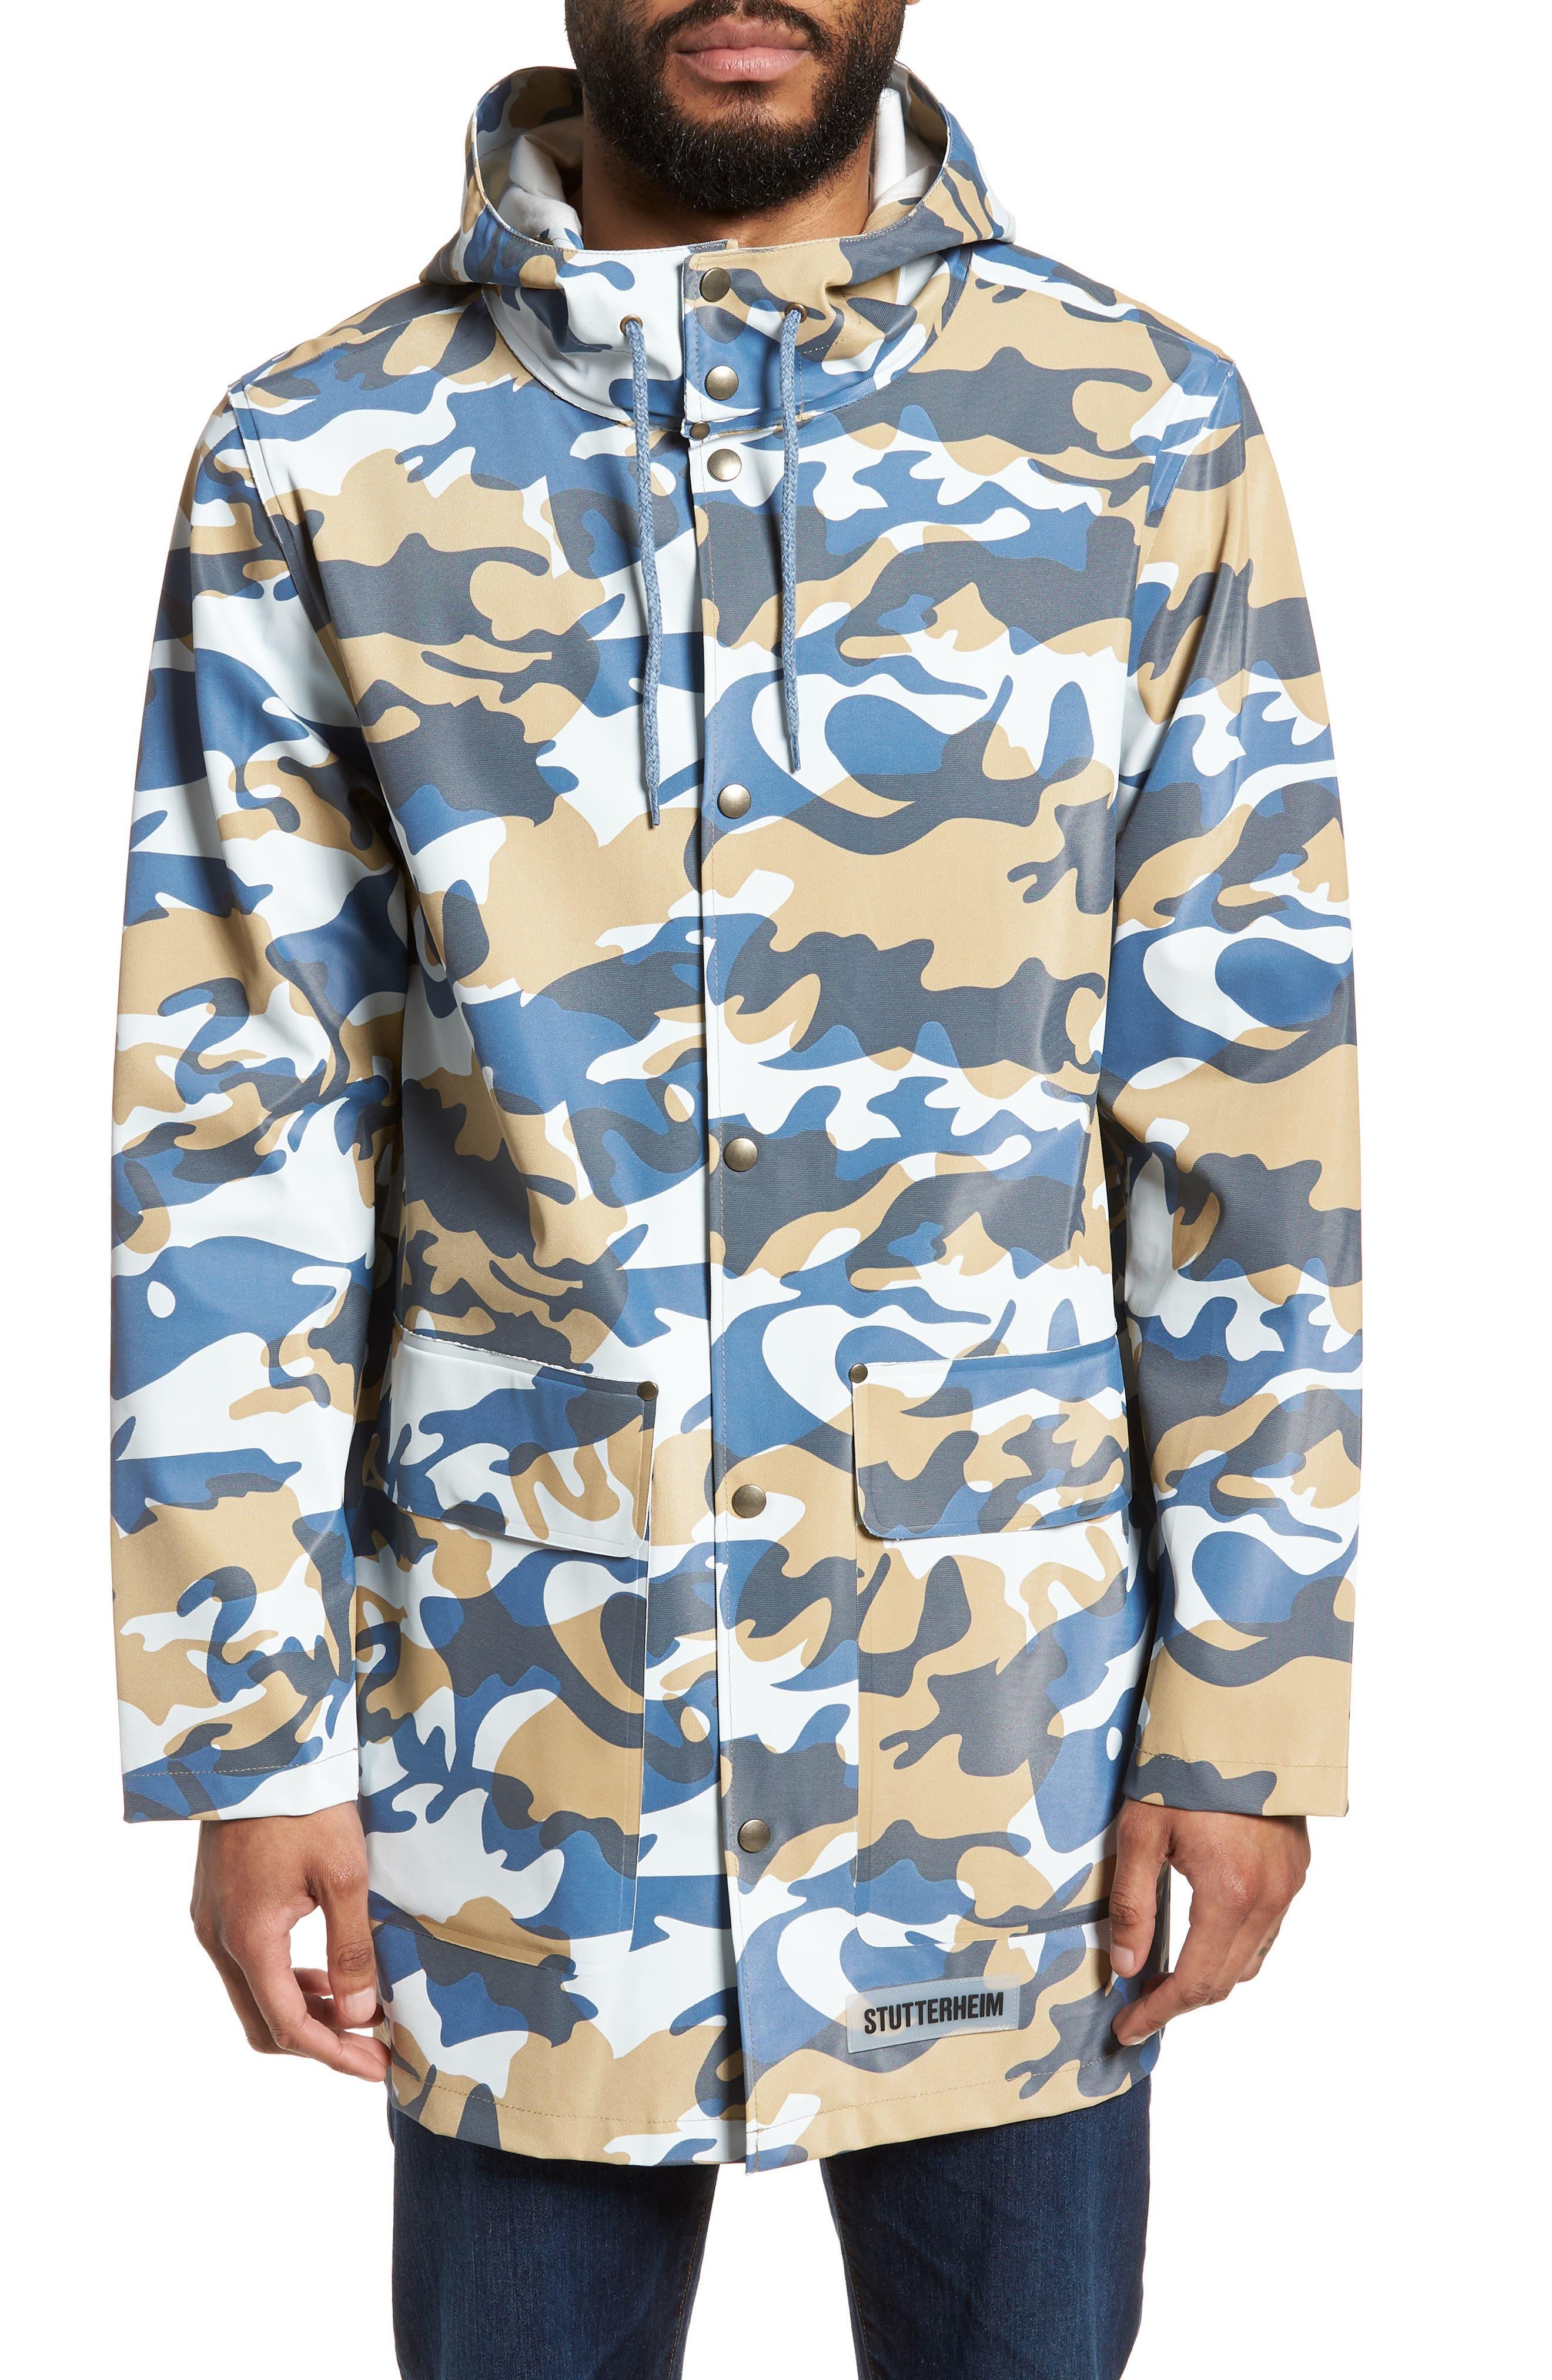 Stockholm Waterproof Hooded Raincoat,                             Main thumbnail 1, color,                             Camo